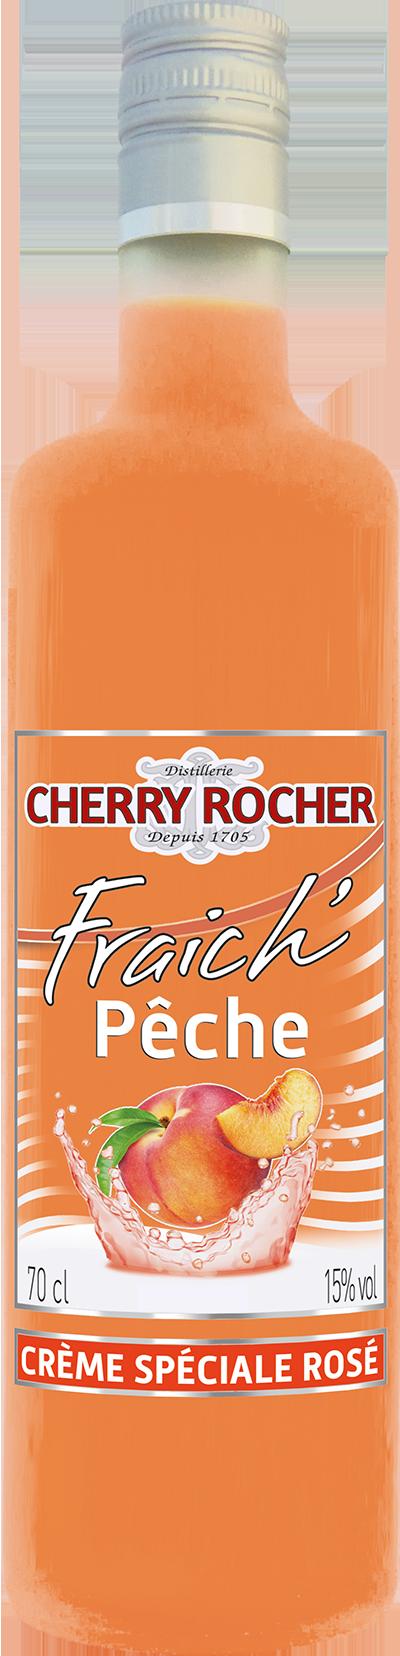 Fraich' Pêche - Cherry Rocher